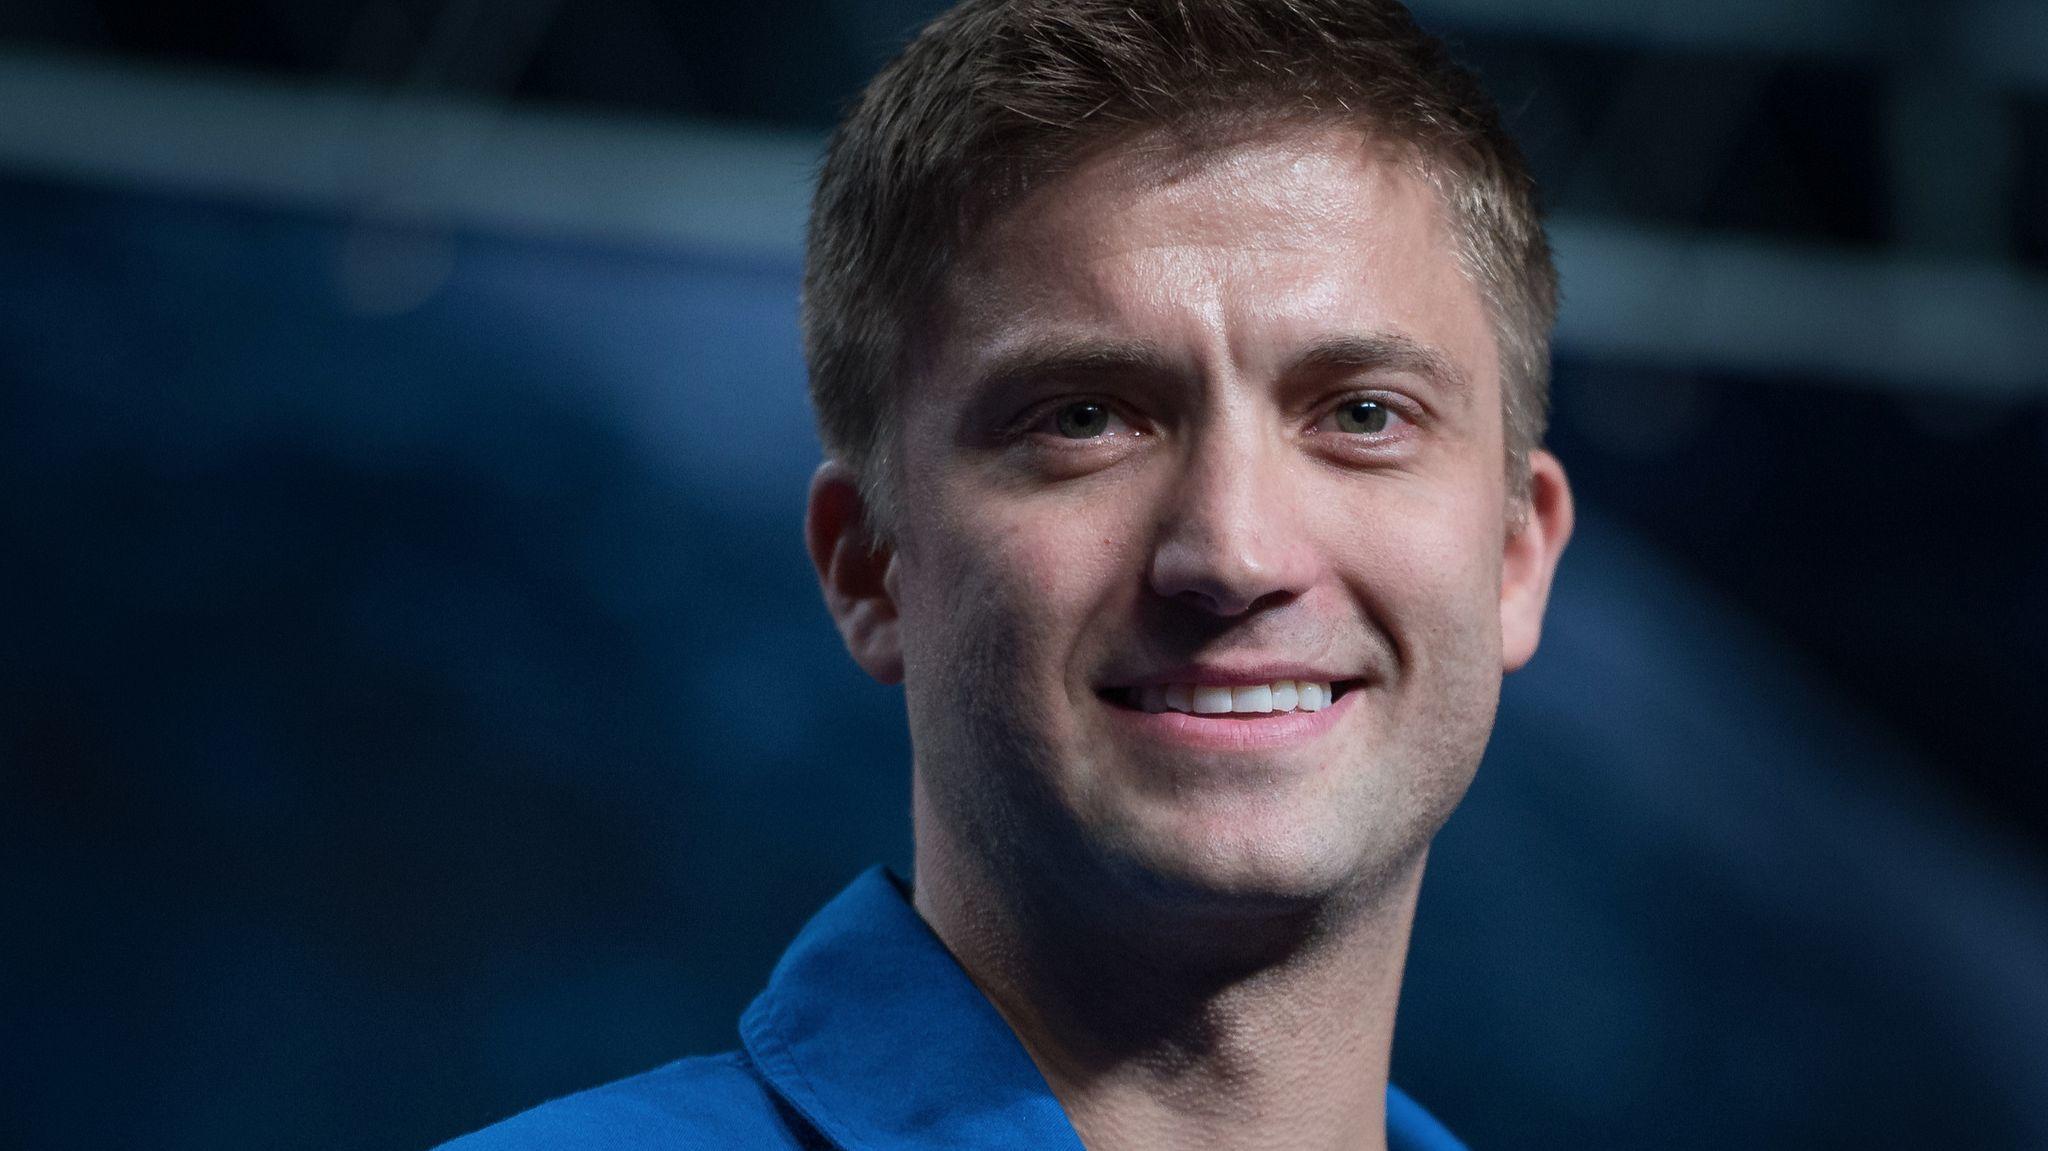 Astronaut Candidate Matthew Dominick